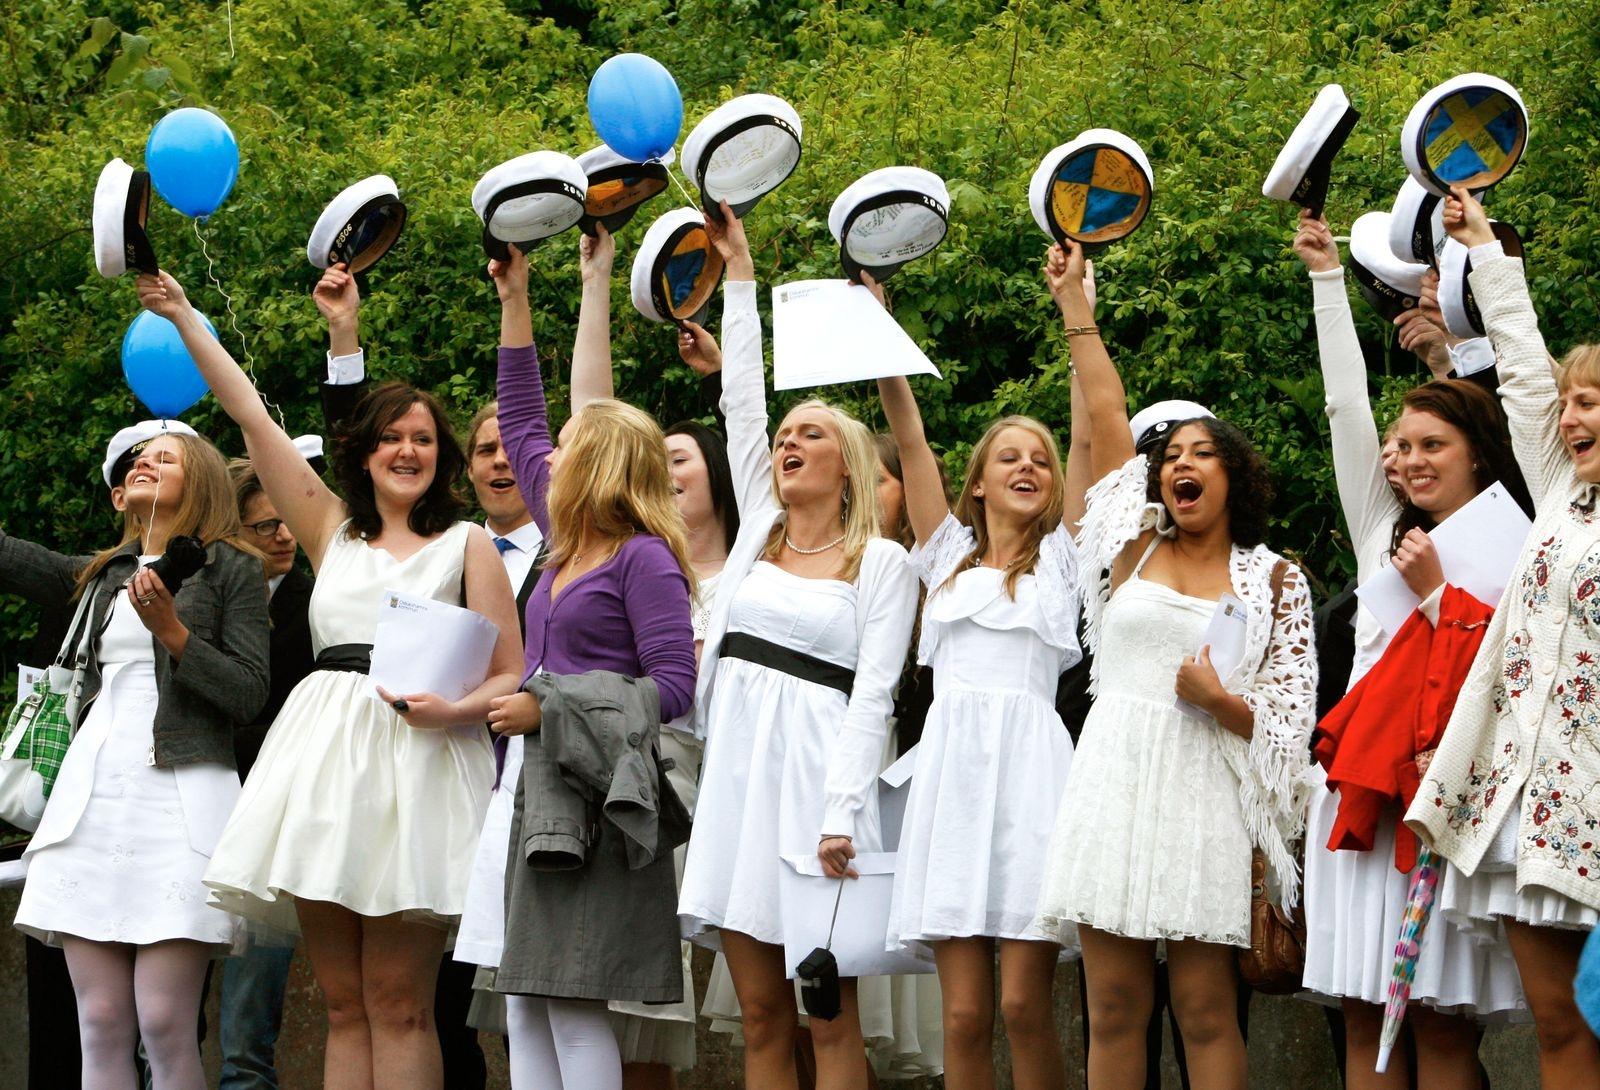 Studentmössorna i skyn på Oscarsgymnasiet 2009.